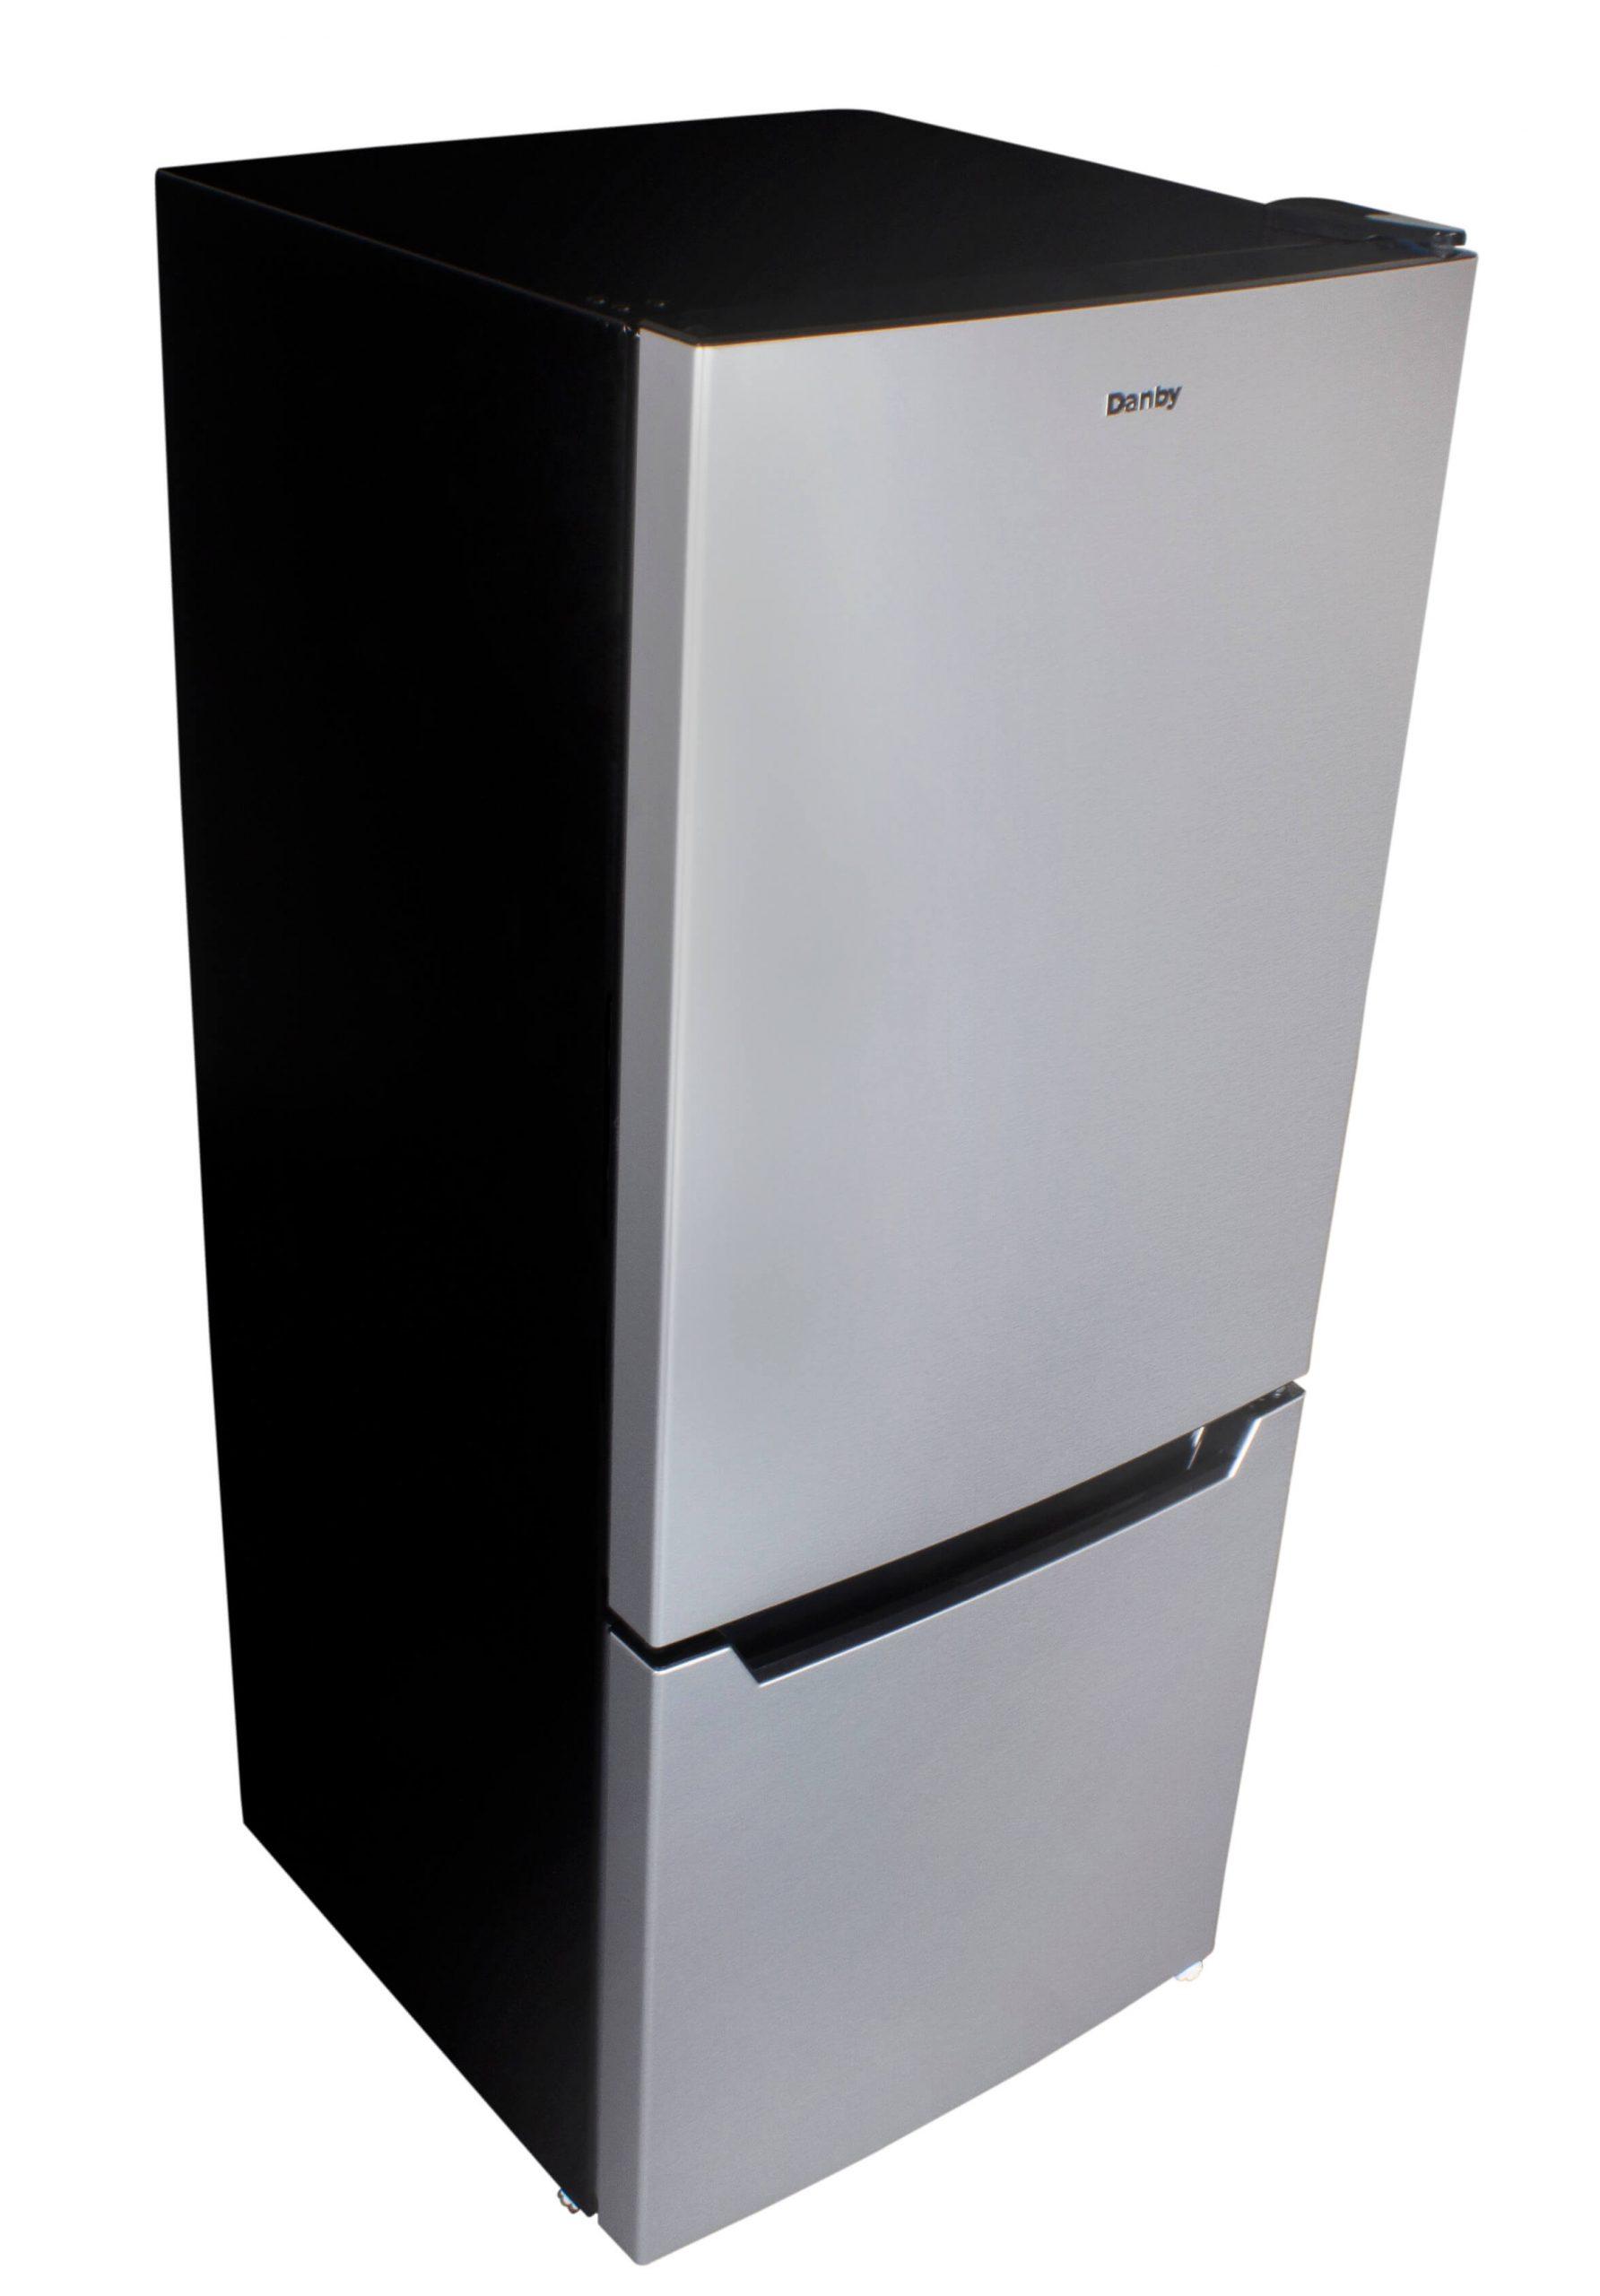 Danby 4.1 cu. ft. Bottom Mount Compact Refrigerator